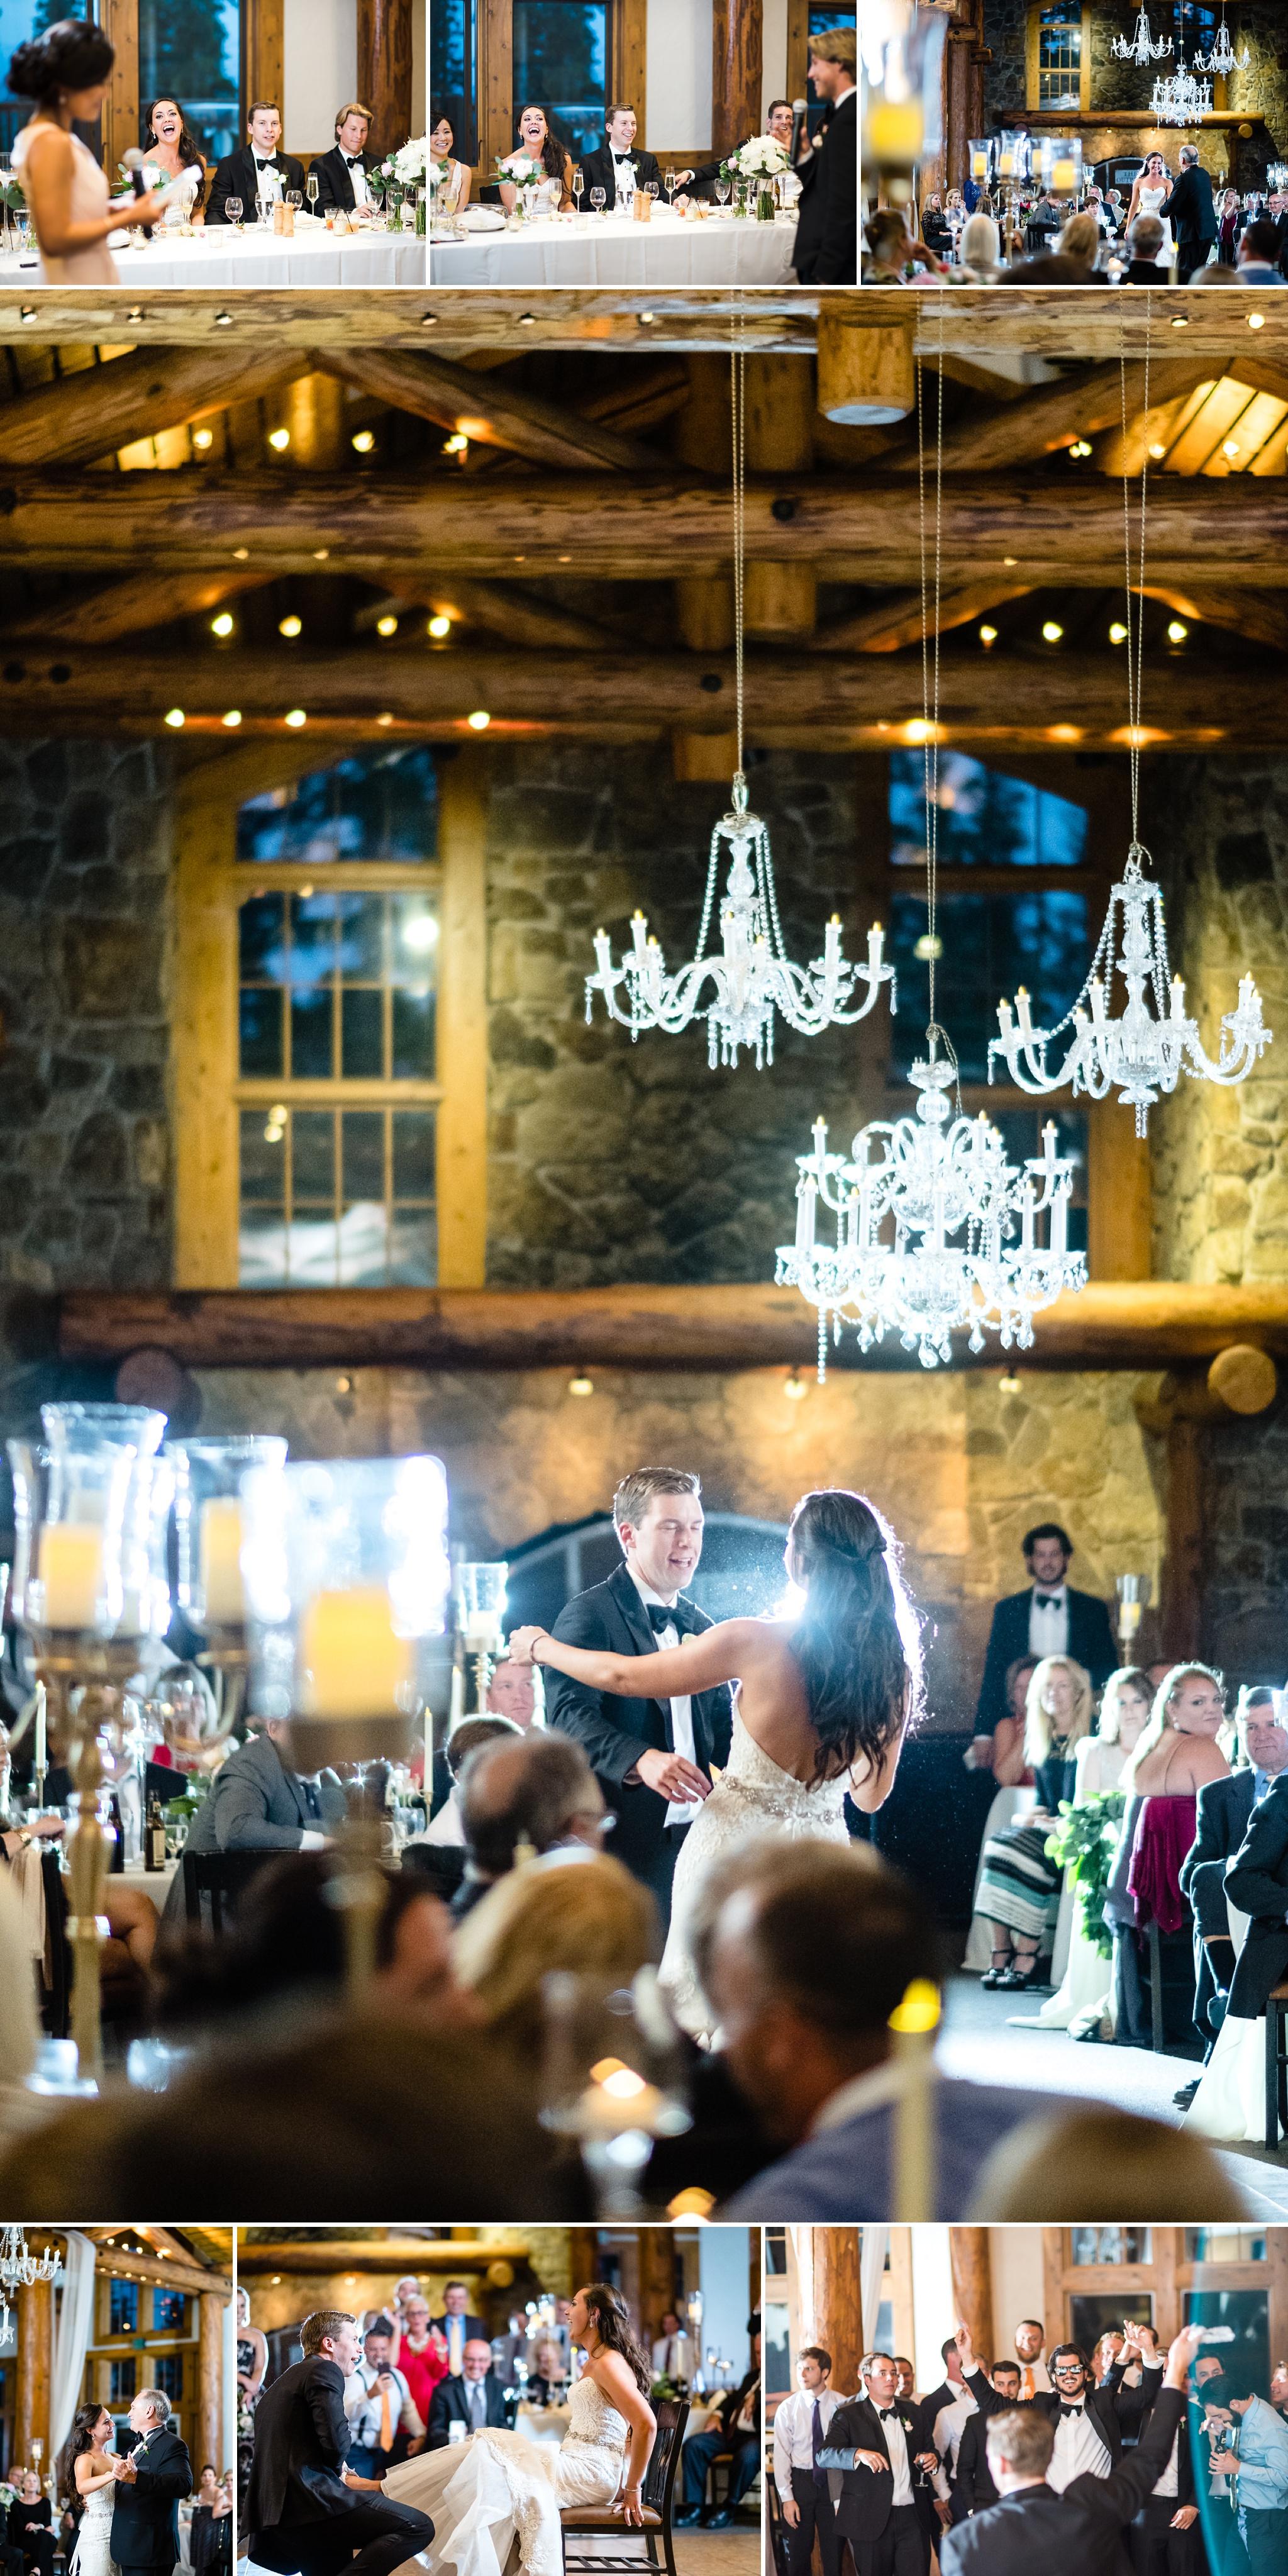 Timber Ridge Lodge Wedding Reception in Keystone, Colorado